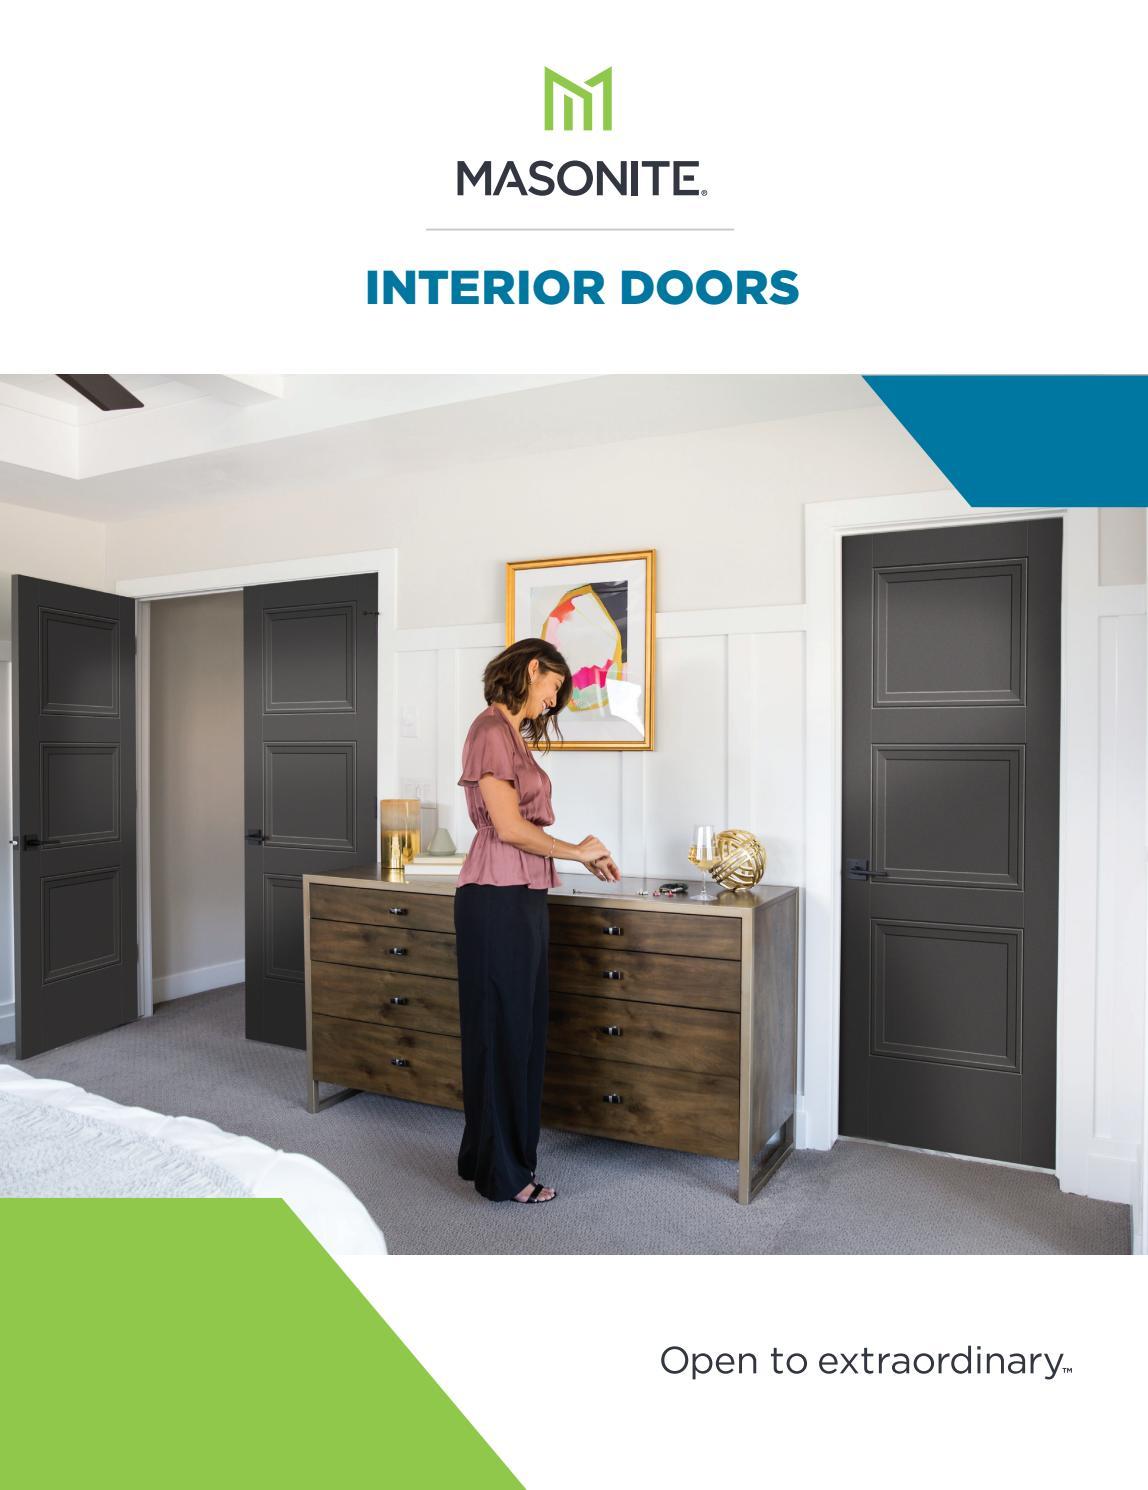 2019 Masonite Interior Door Catalog By Clearymillwork Issuu